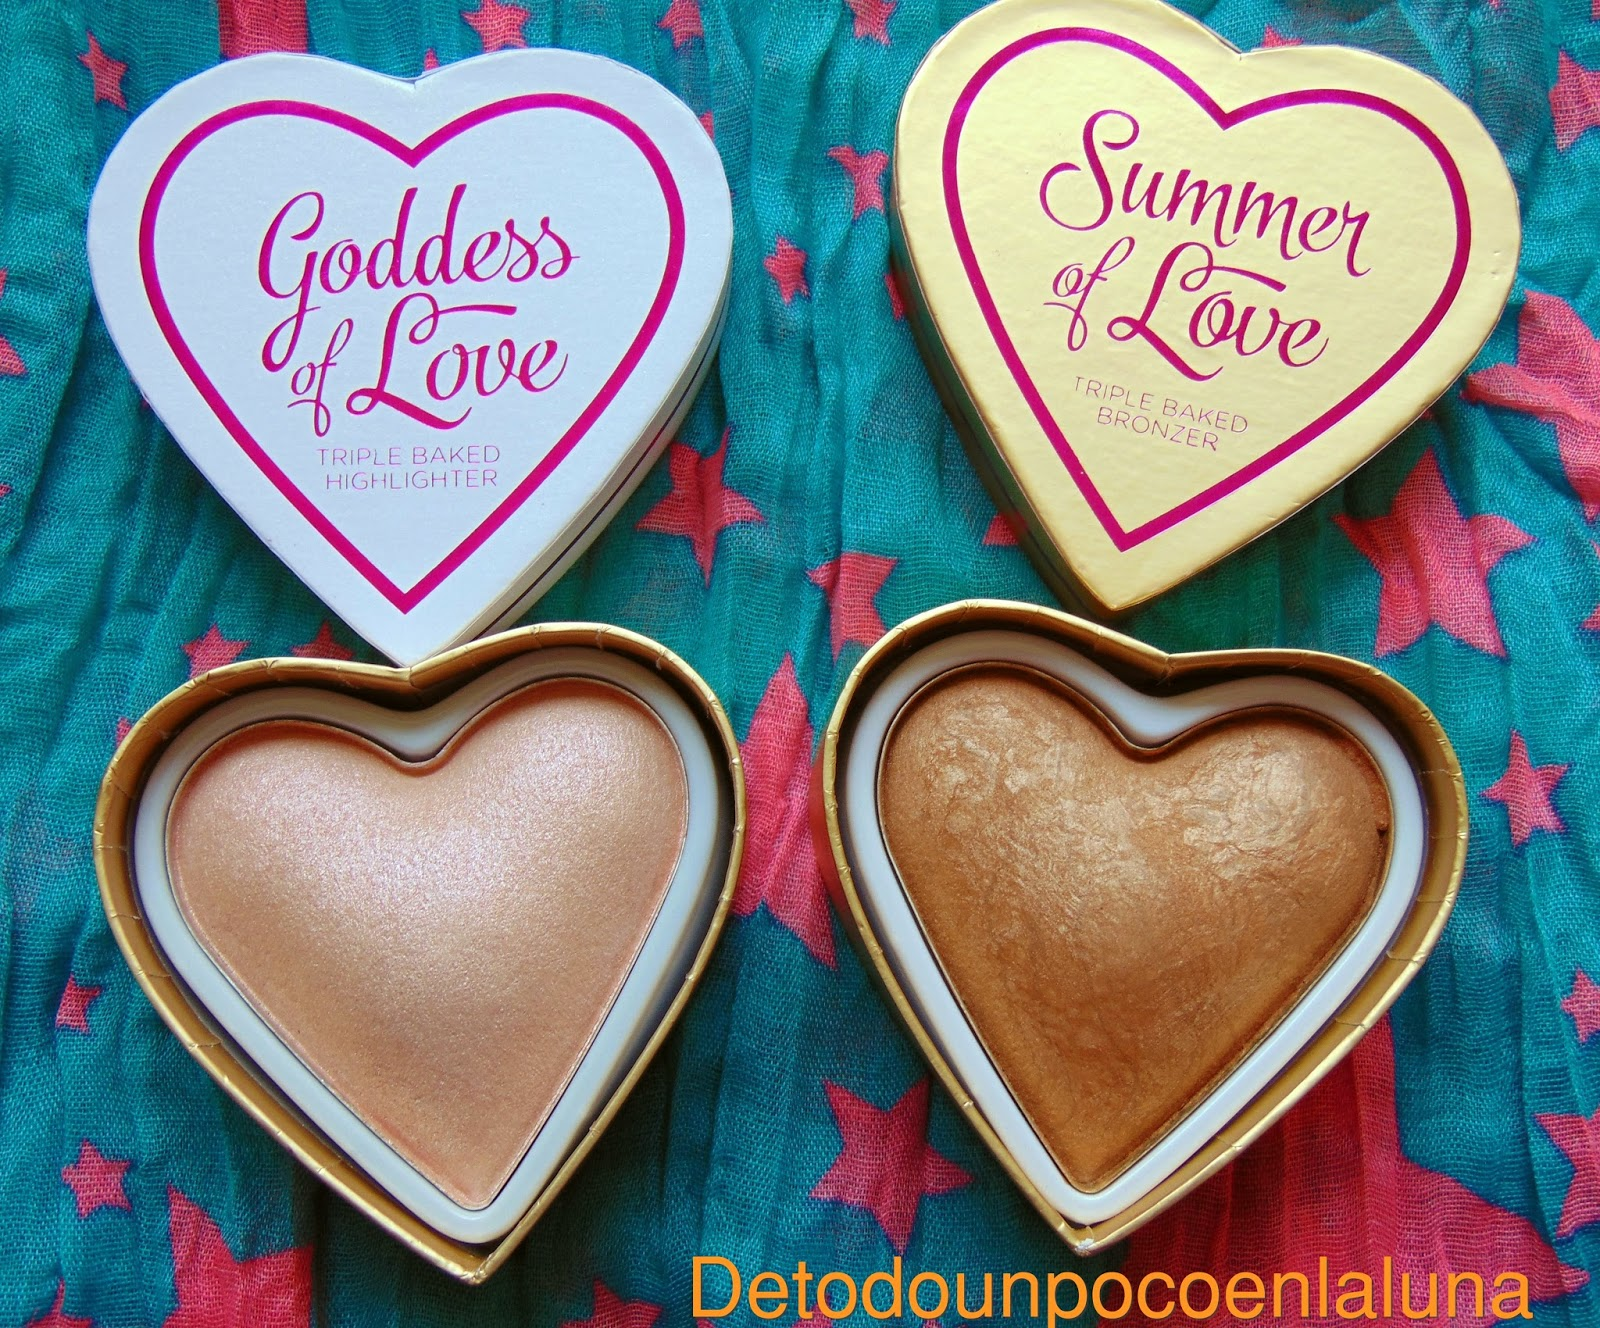 iluminador goddes of love bronceador summer of love I heart makeup